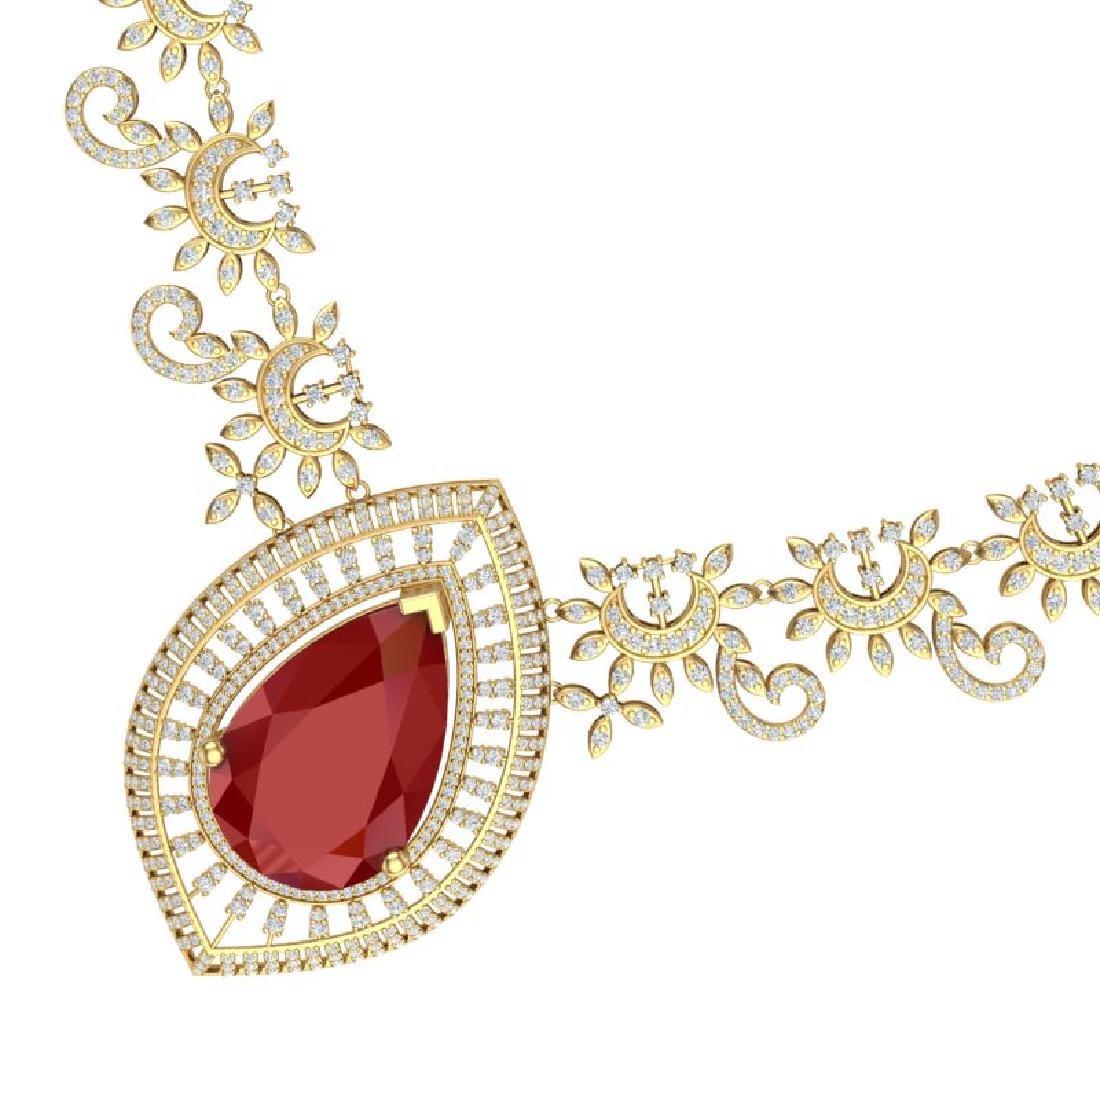 65.75 CTW Royalty Ruby & VS Diamond Necklace 18K Yellow